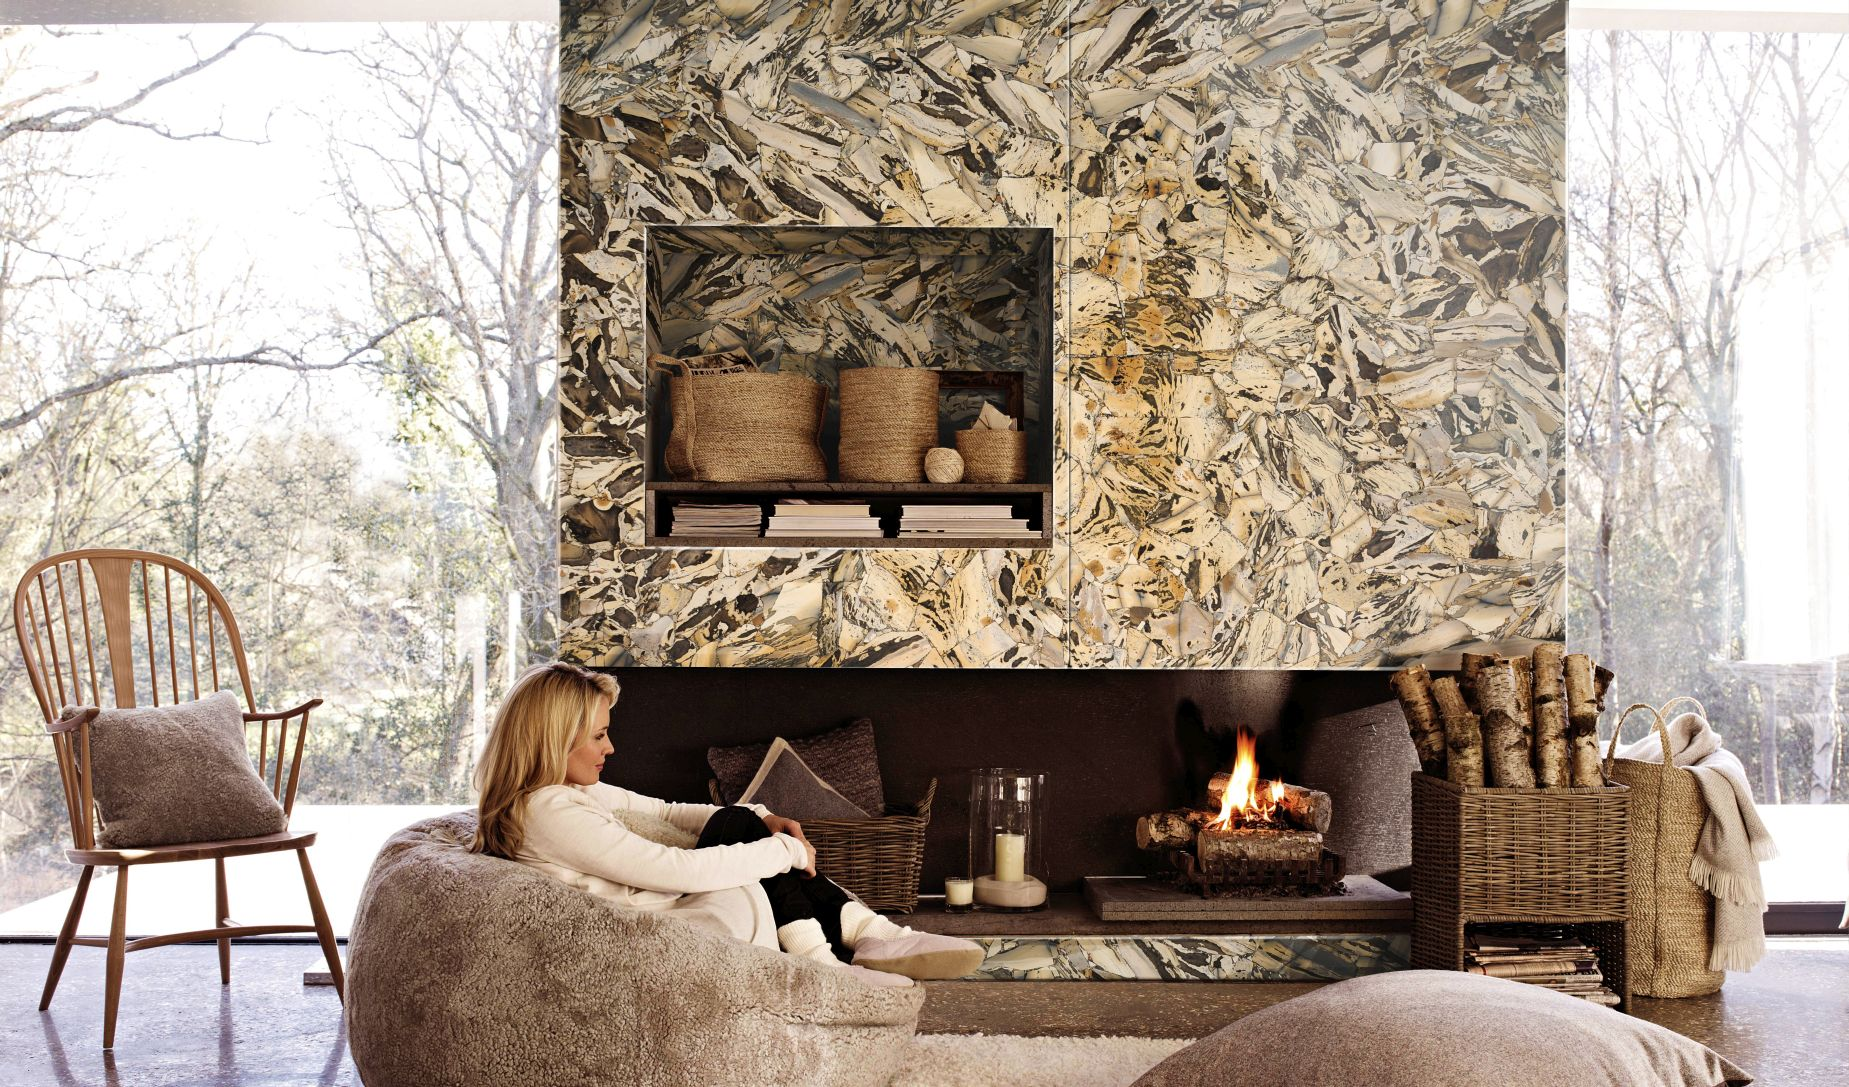 Jasper Zebra fire place